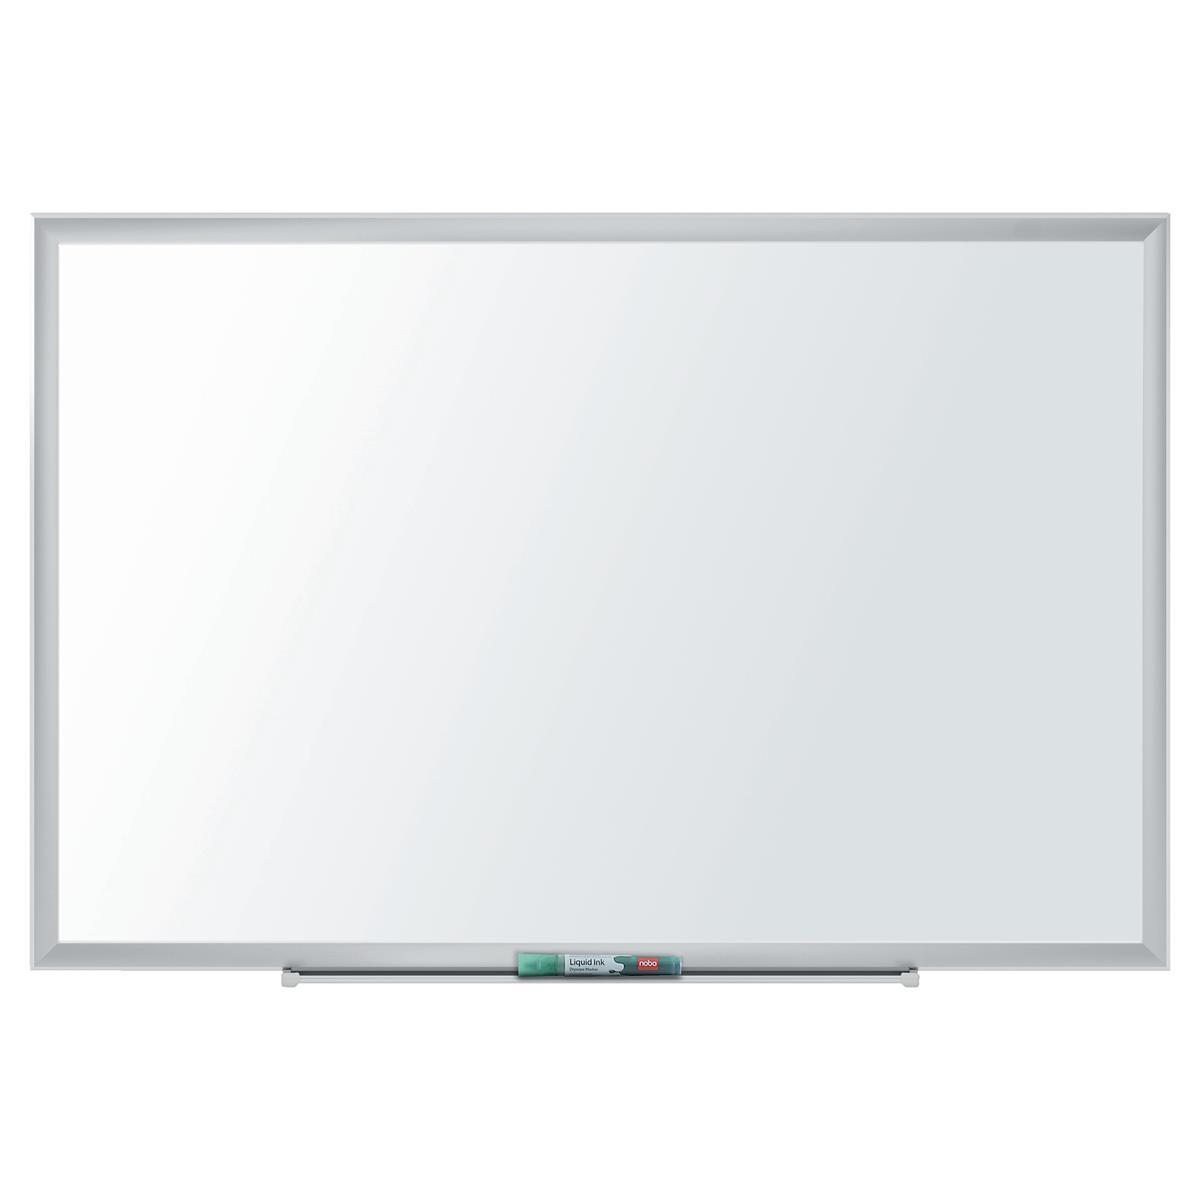 Nobo Nano Clean Steel Whiteboard Magnetic Exclusive Nano Clean Surface W1200xH900mm White Ref 1905168